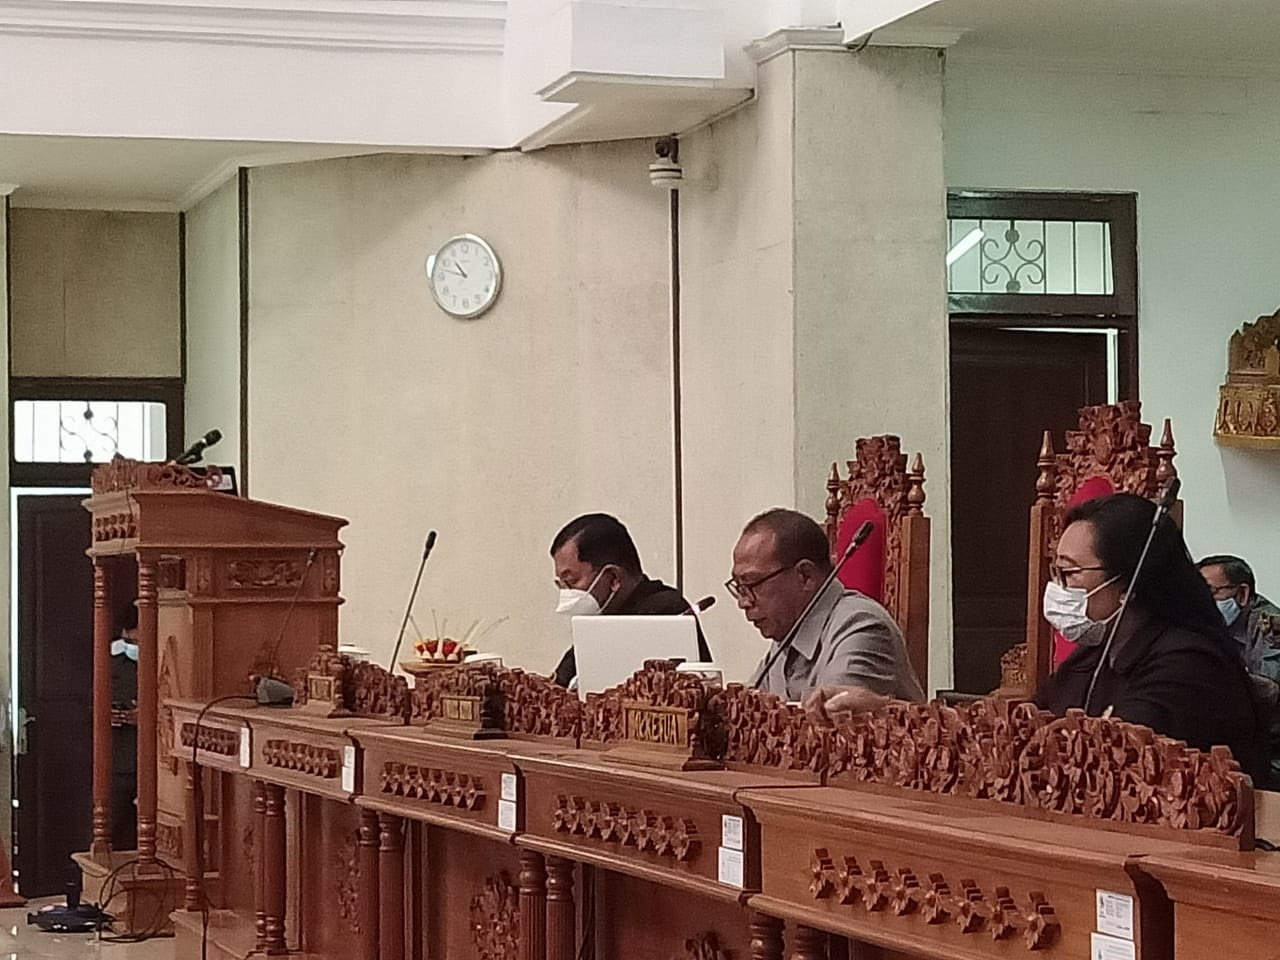 RAPAT Paripurna pandangan umum fraksi-fraksi DPRD Buleleng atas Ranperda Buleleng tentang APBD Tahun Anggaran 2021. Foto: rik